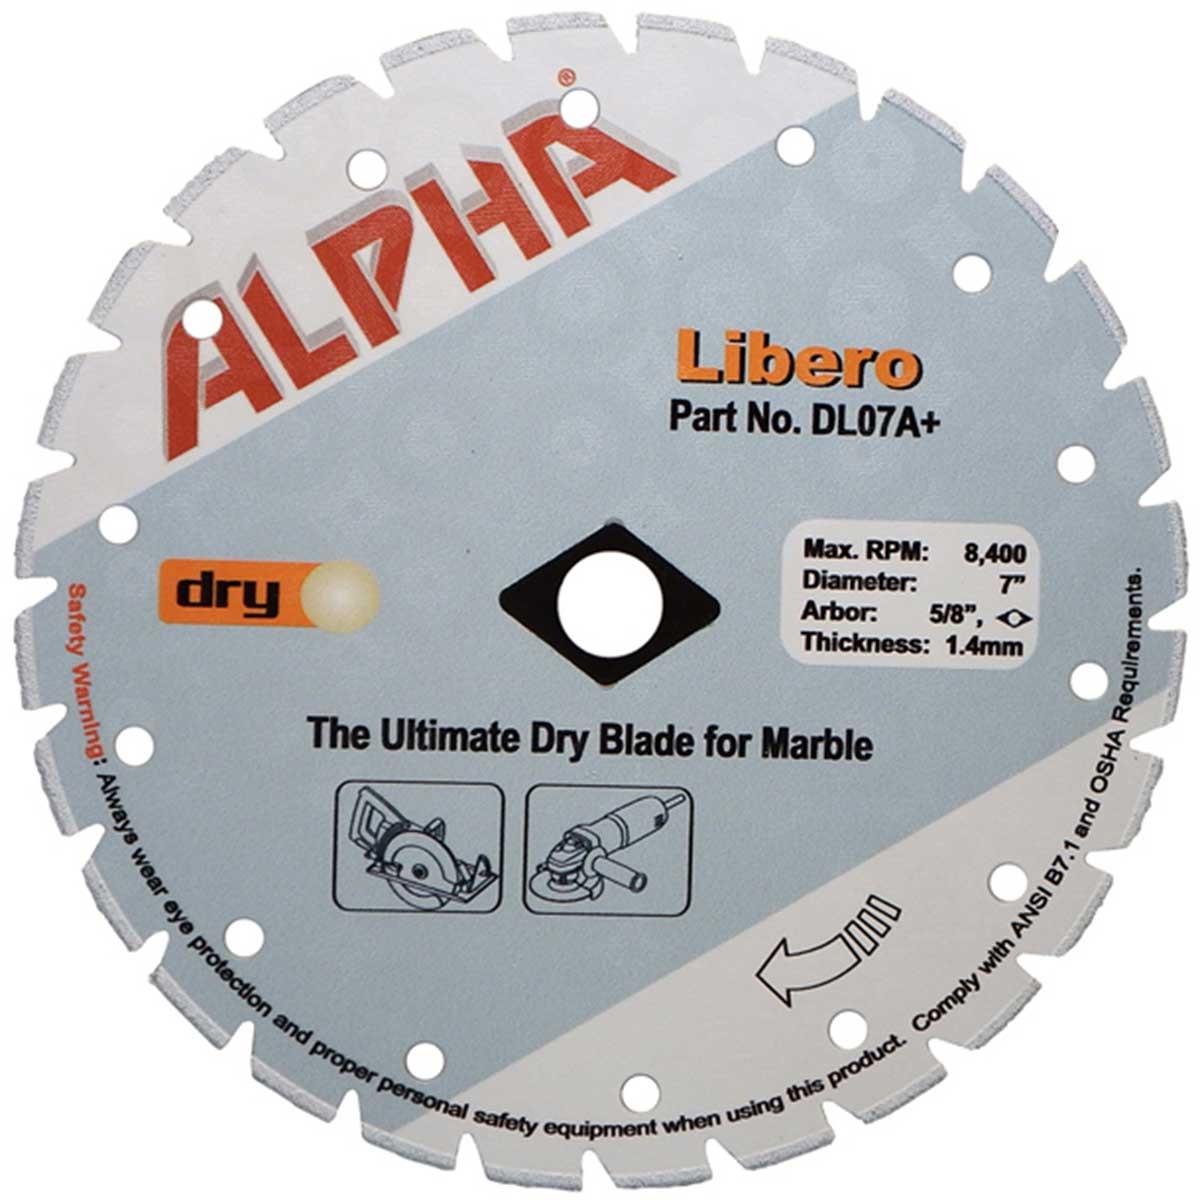 alpha libero 7in dry marble diamond blade